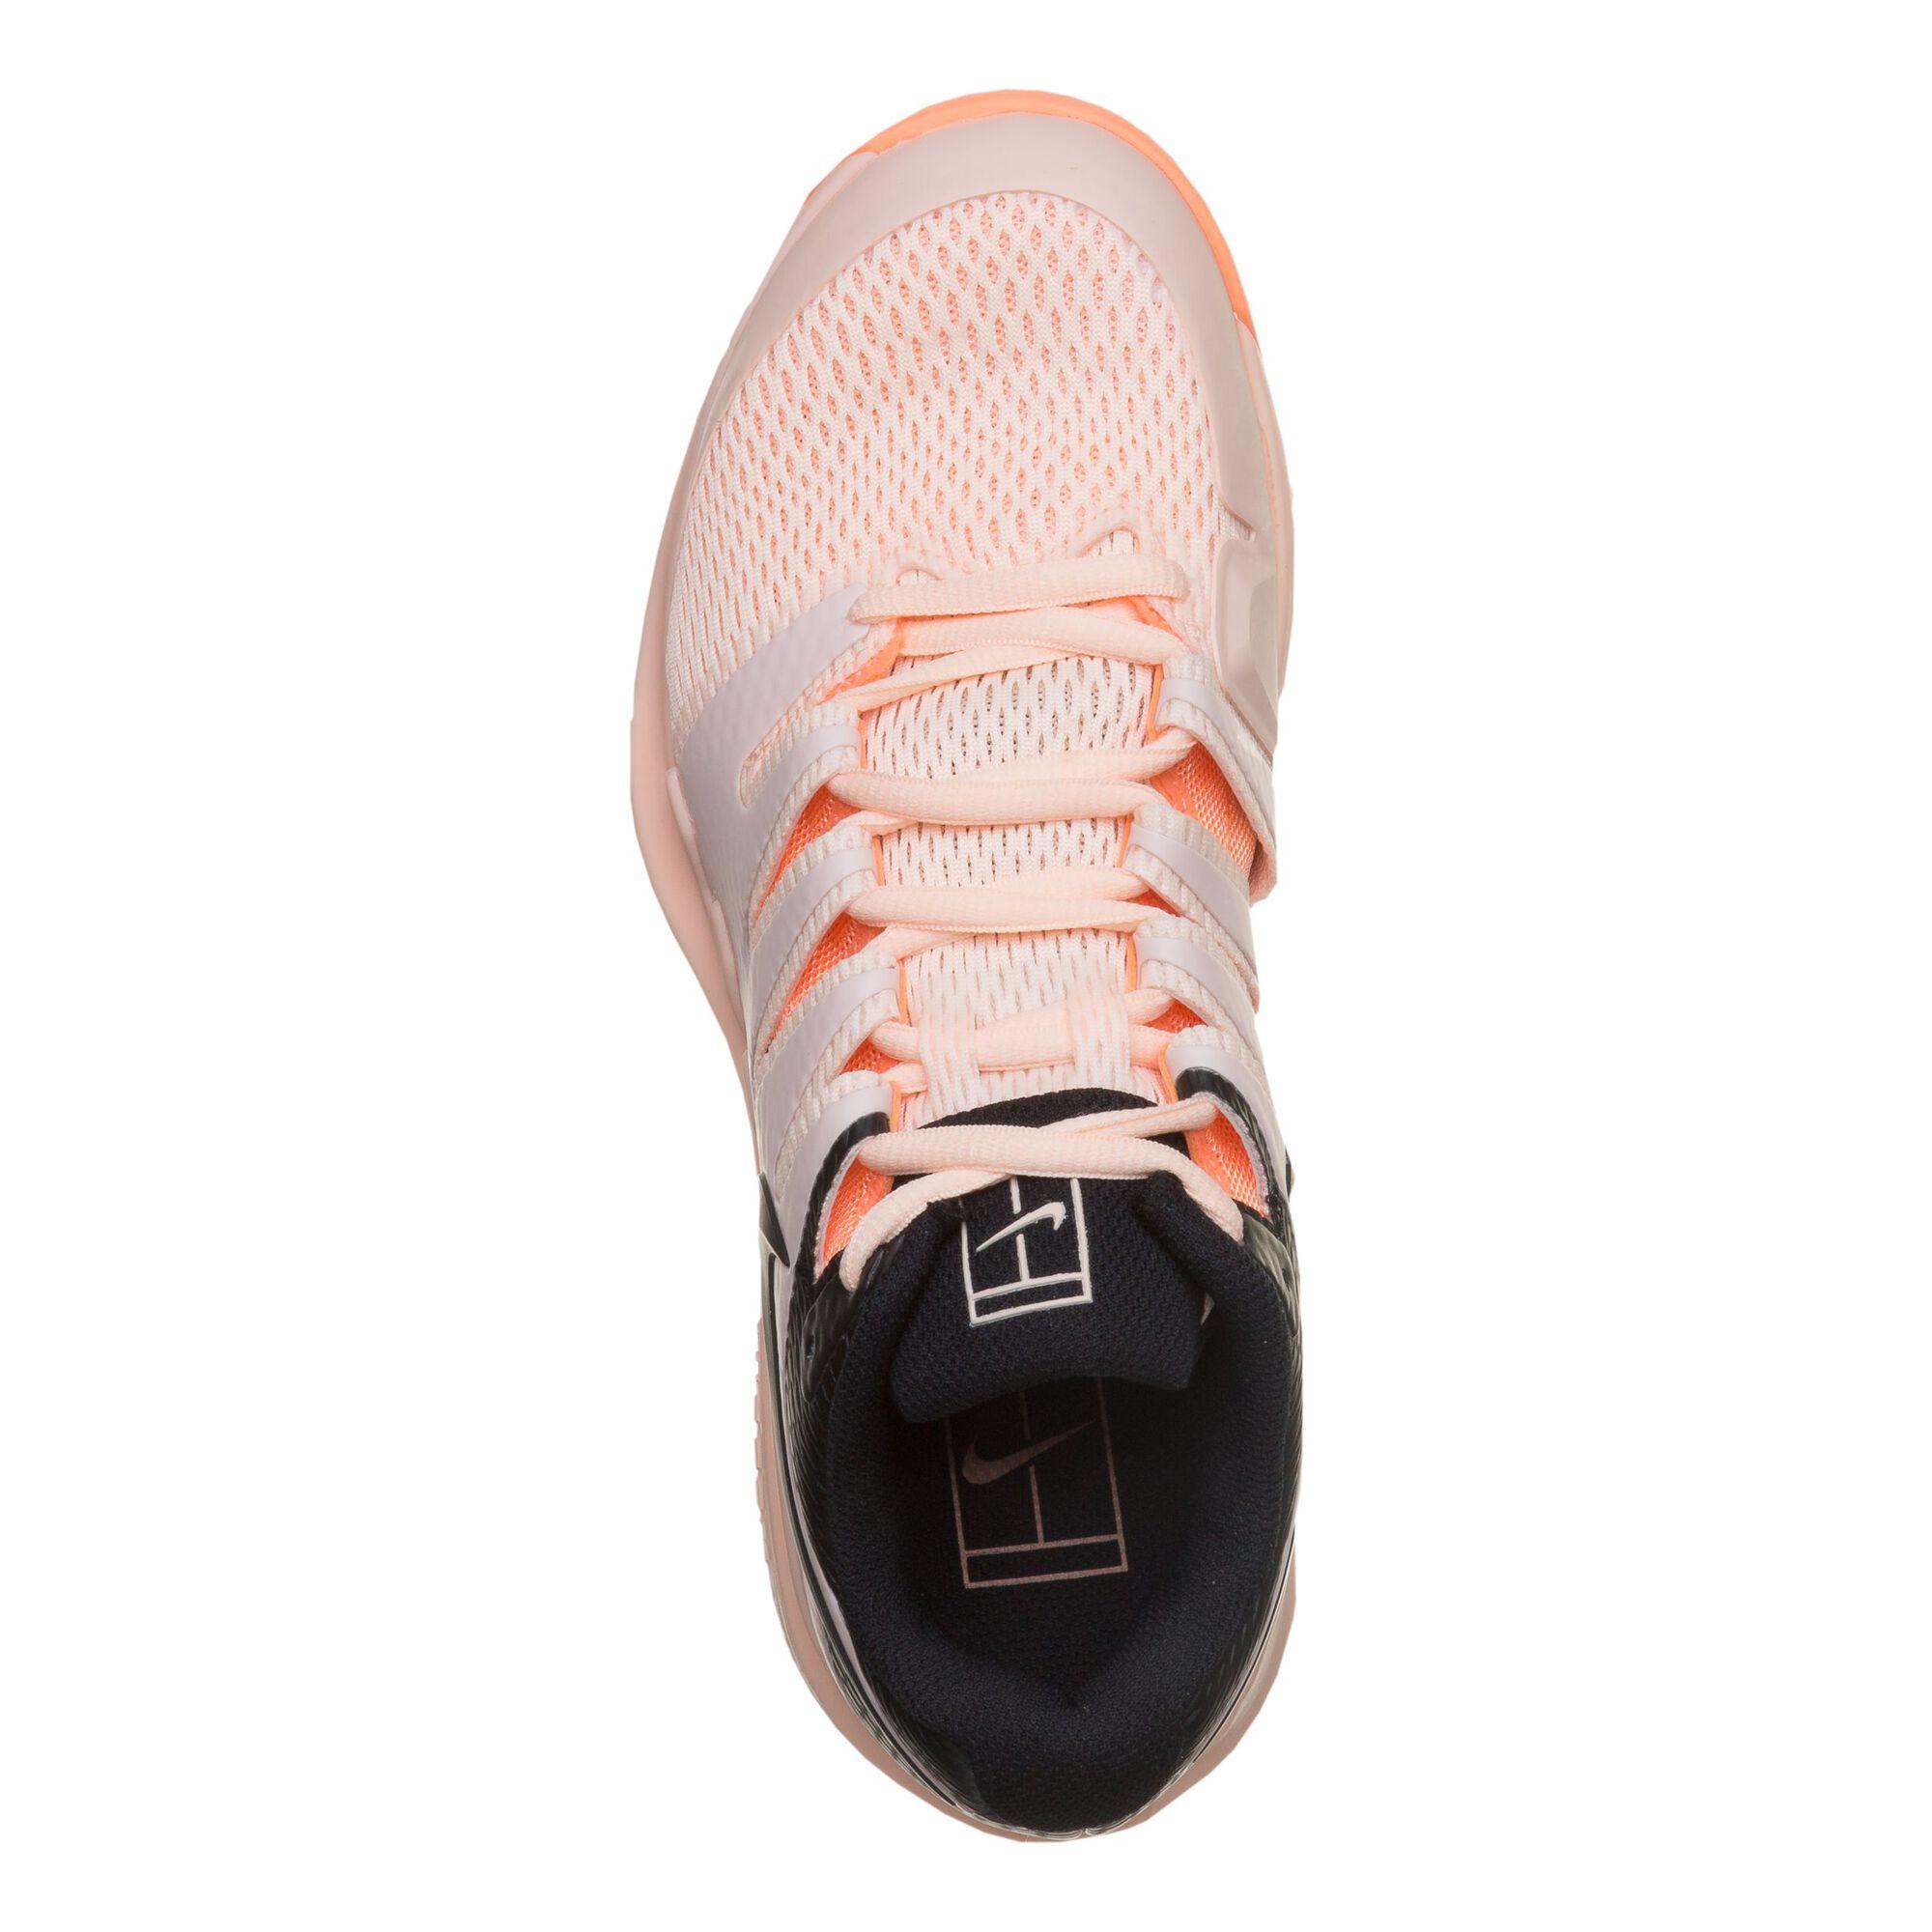 5d0daf31550e Nike Zoom Vapor X Allcourtschuh Damen - Apricot